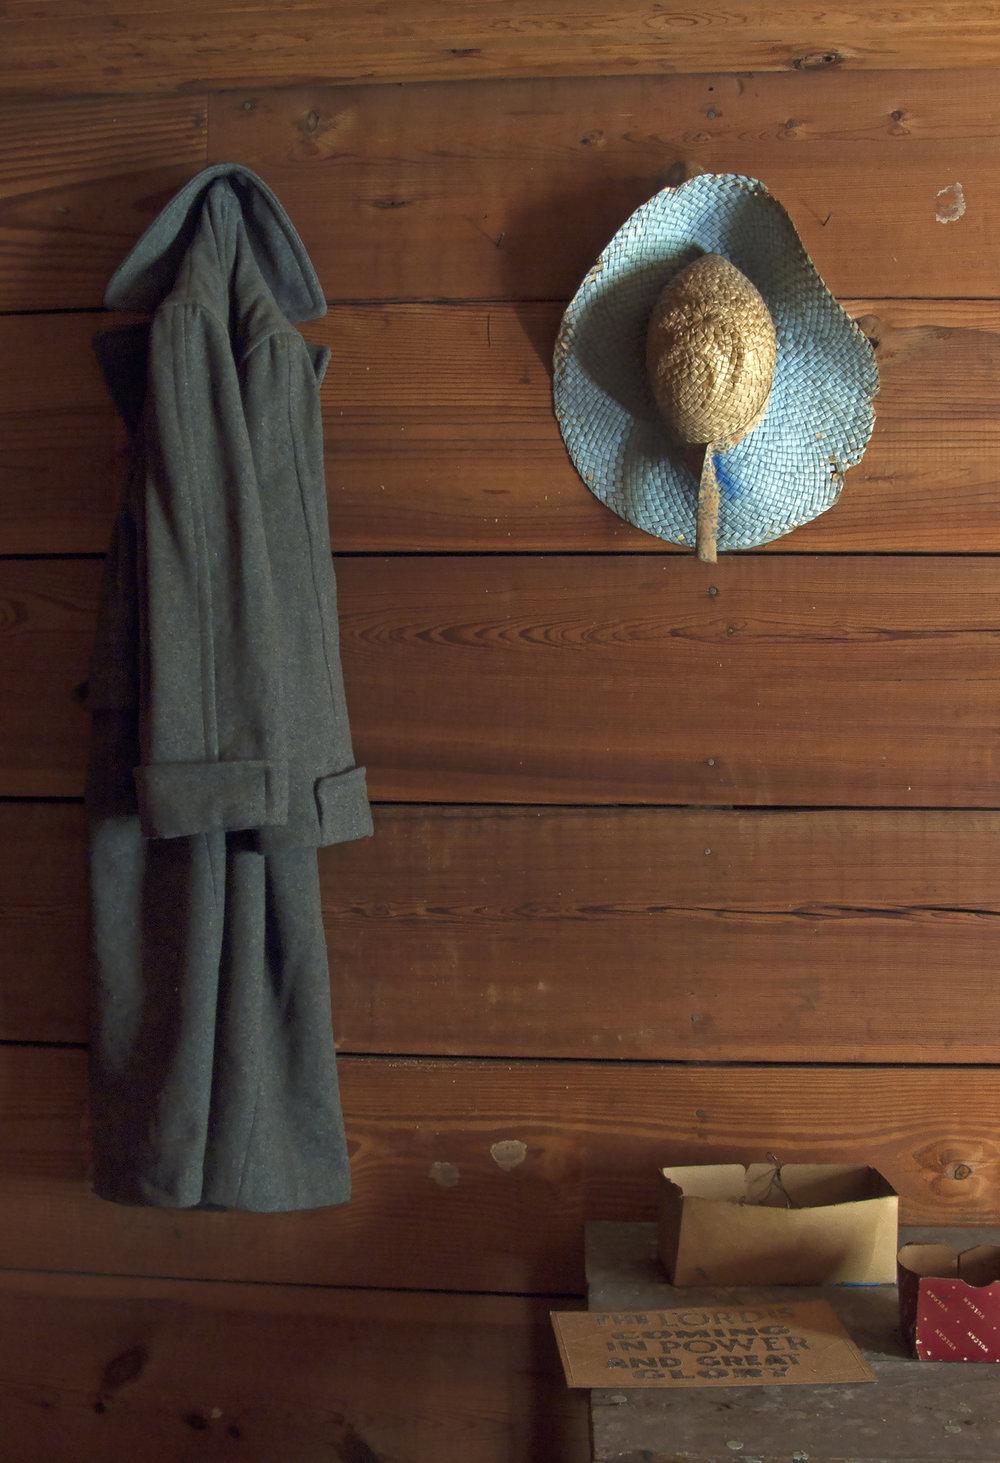 Carol-Lawrence-Coat-and-Hat-fixed-9-17.jpg